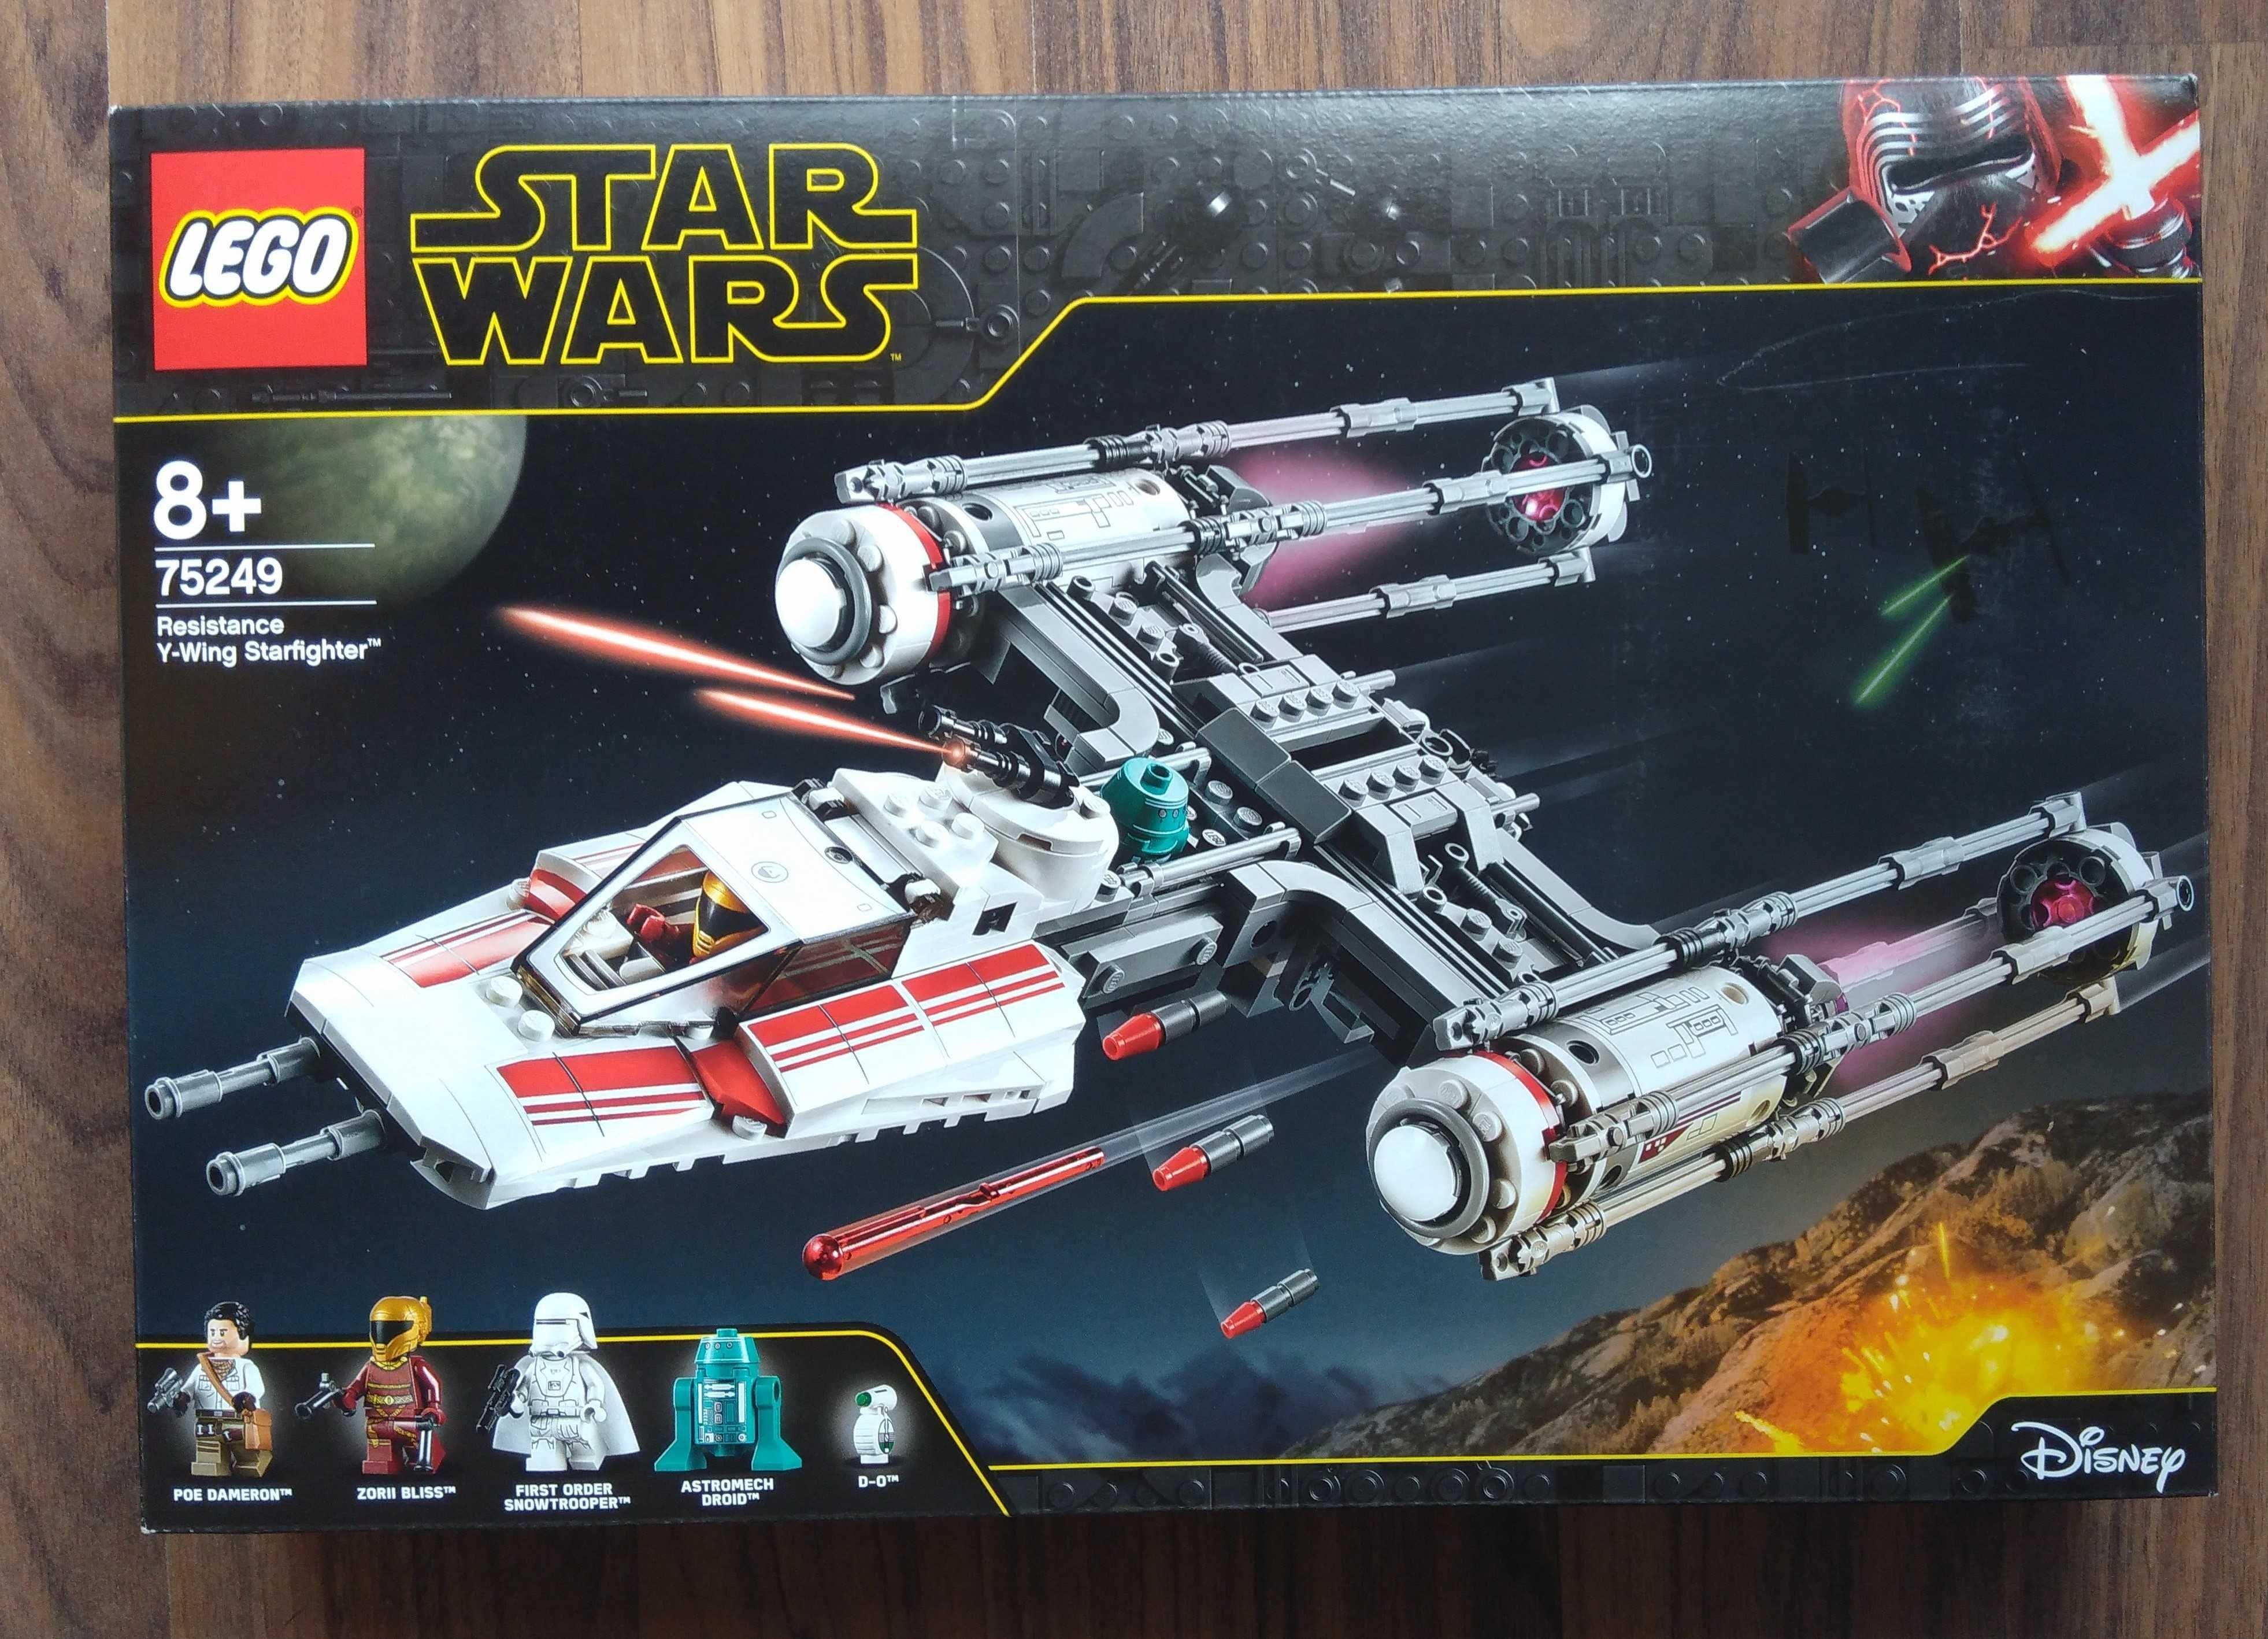 LEGO Star Wars 75249 Y-Wing Starfighter da Resistência (NOVO E SELADO)